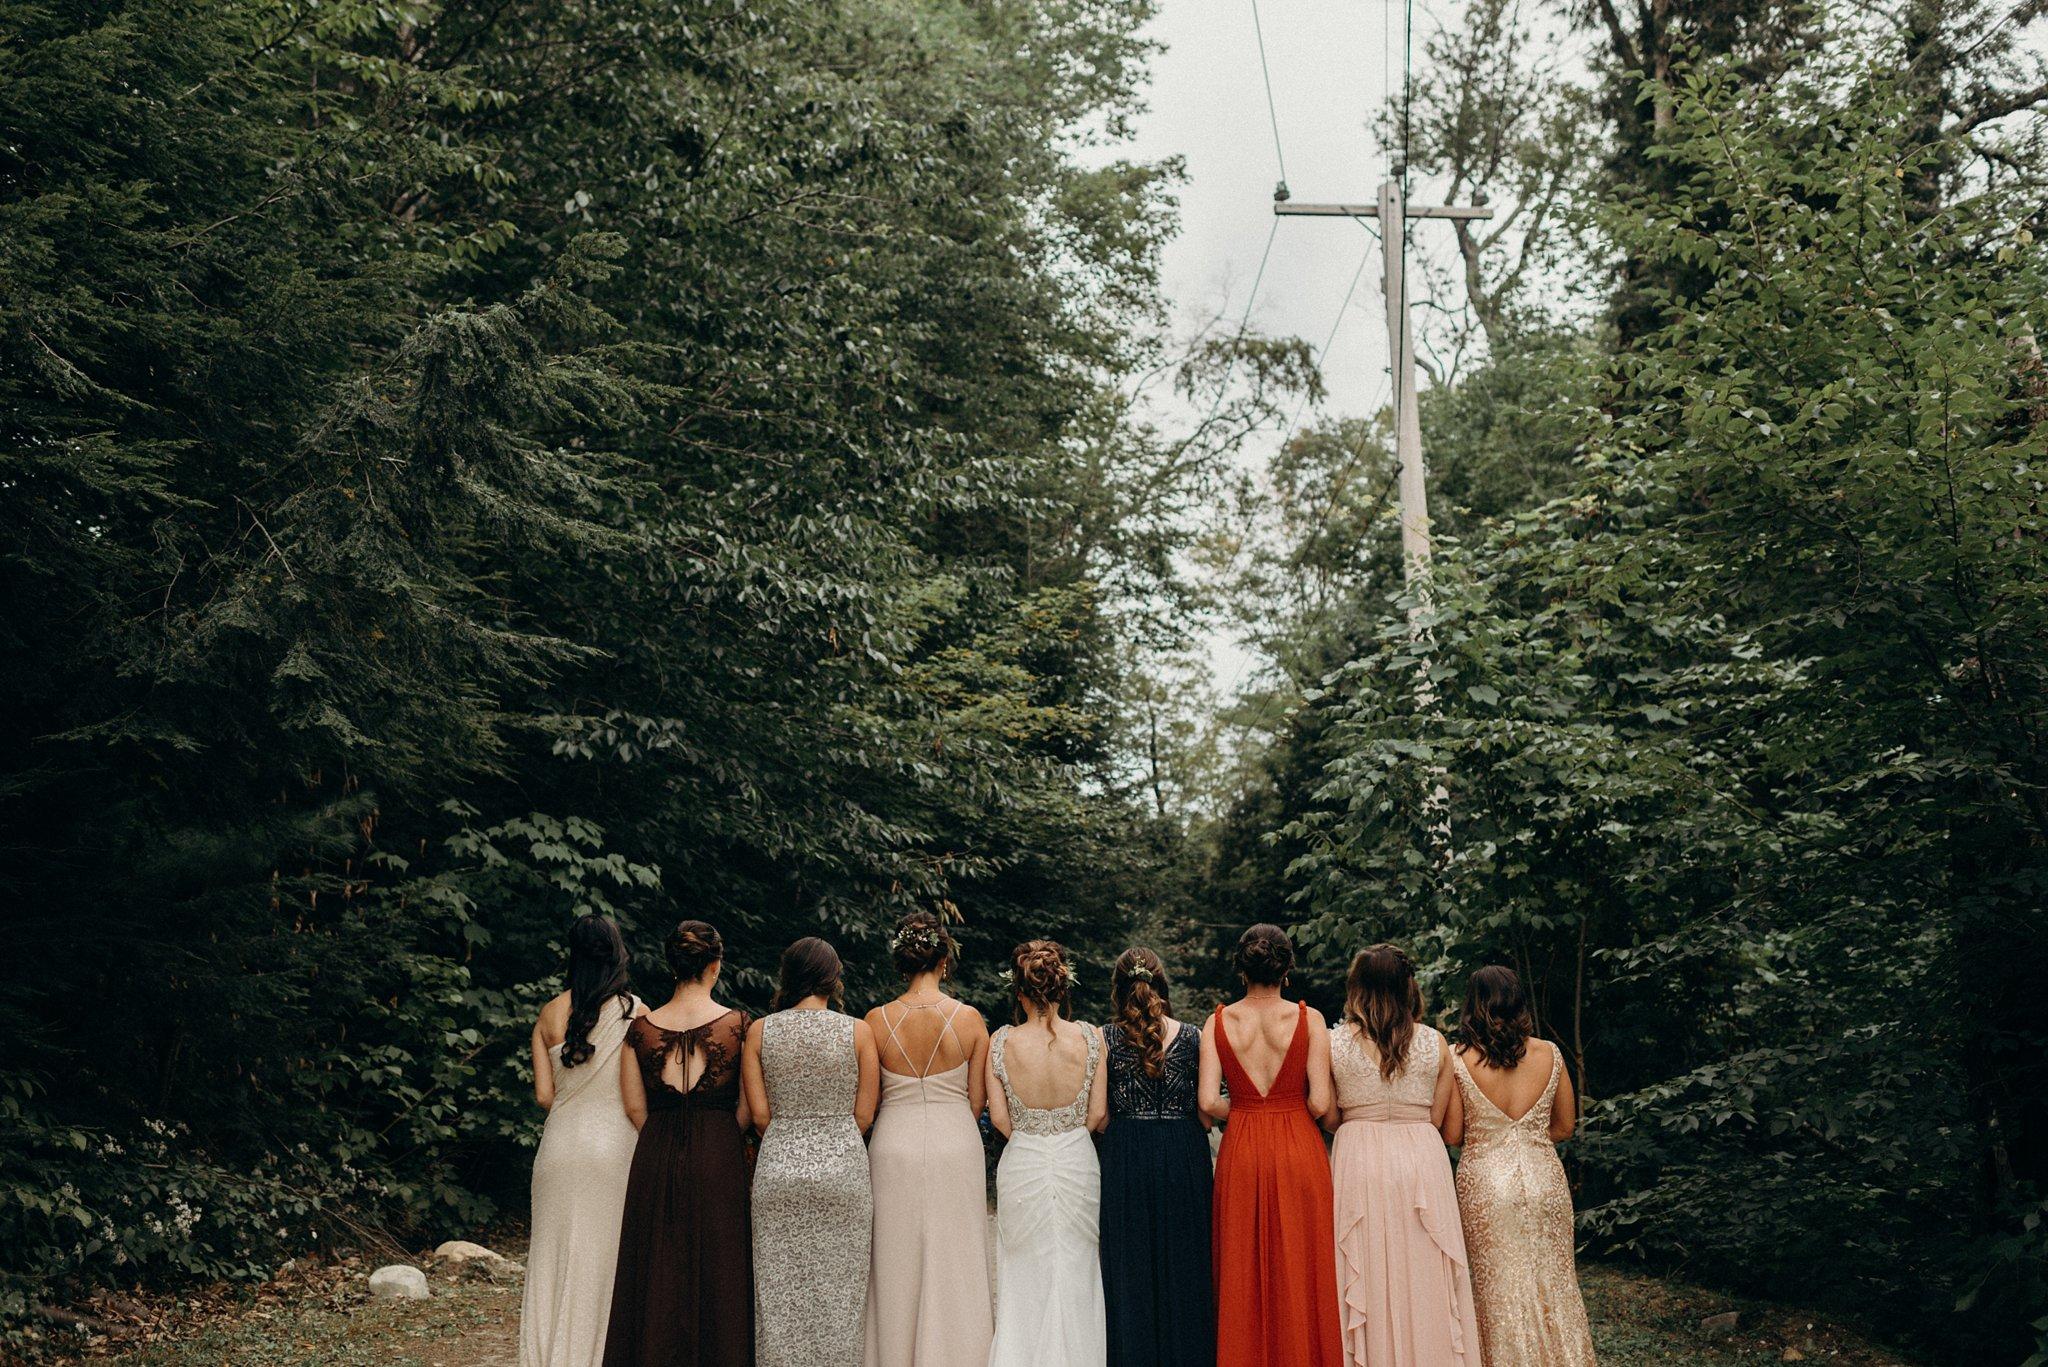 kaihla_tonai_intimate_wedding_elopement_photographer_6614.jpg